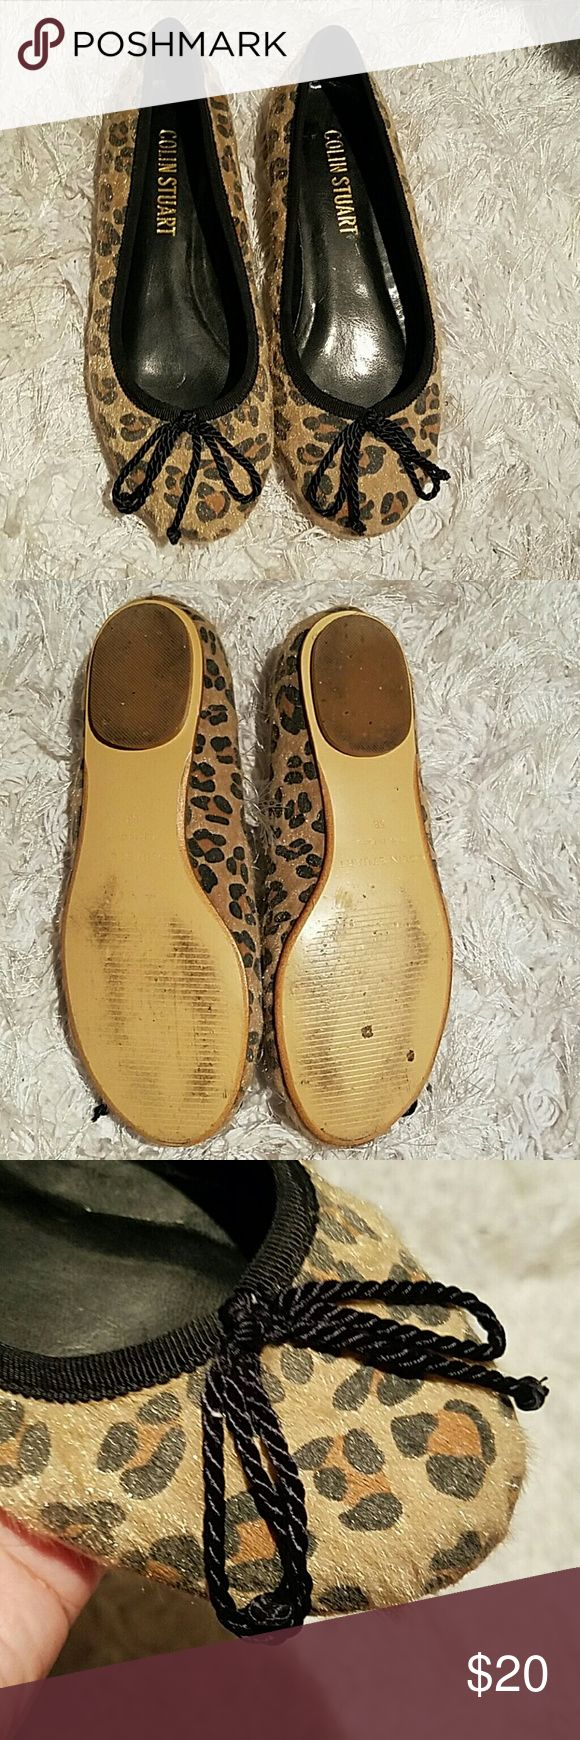 Colin Stuart flats Leopard flats in great condition. Colin Stuart Shoes Flats & Loafers